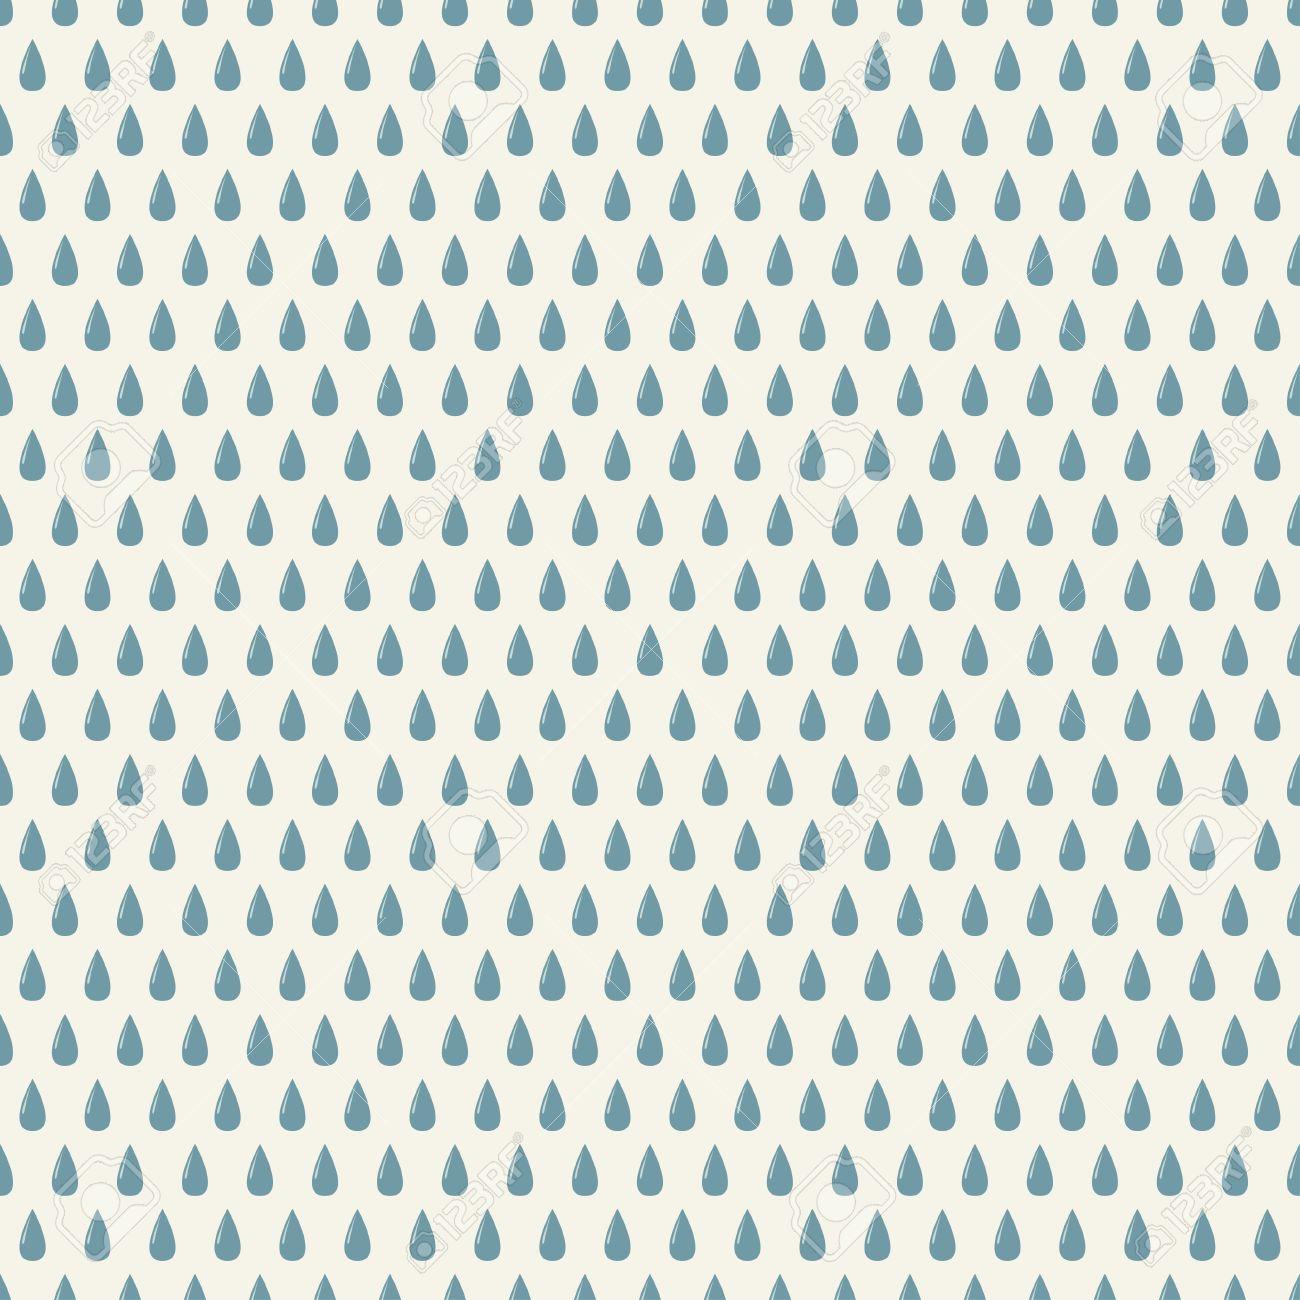 Drops Patterns Interesting Inspiration